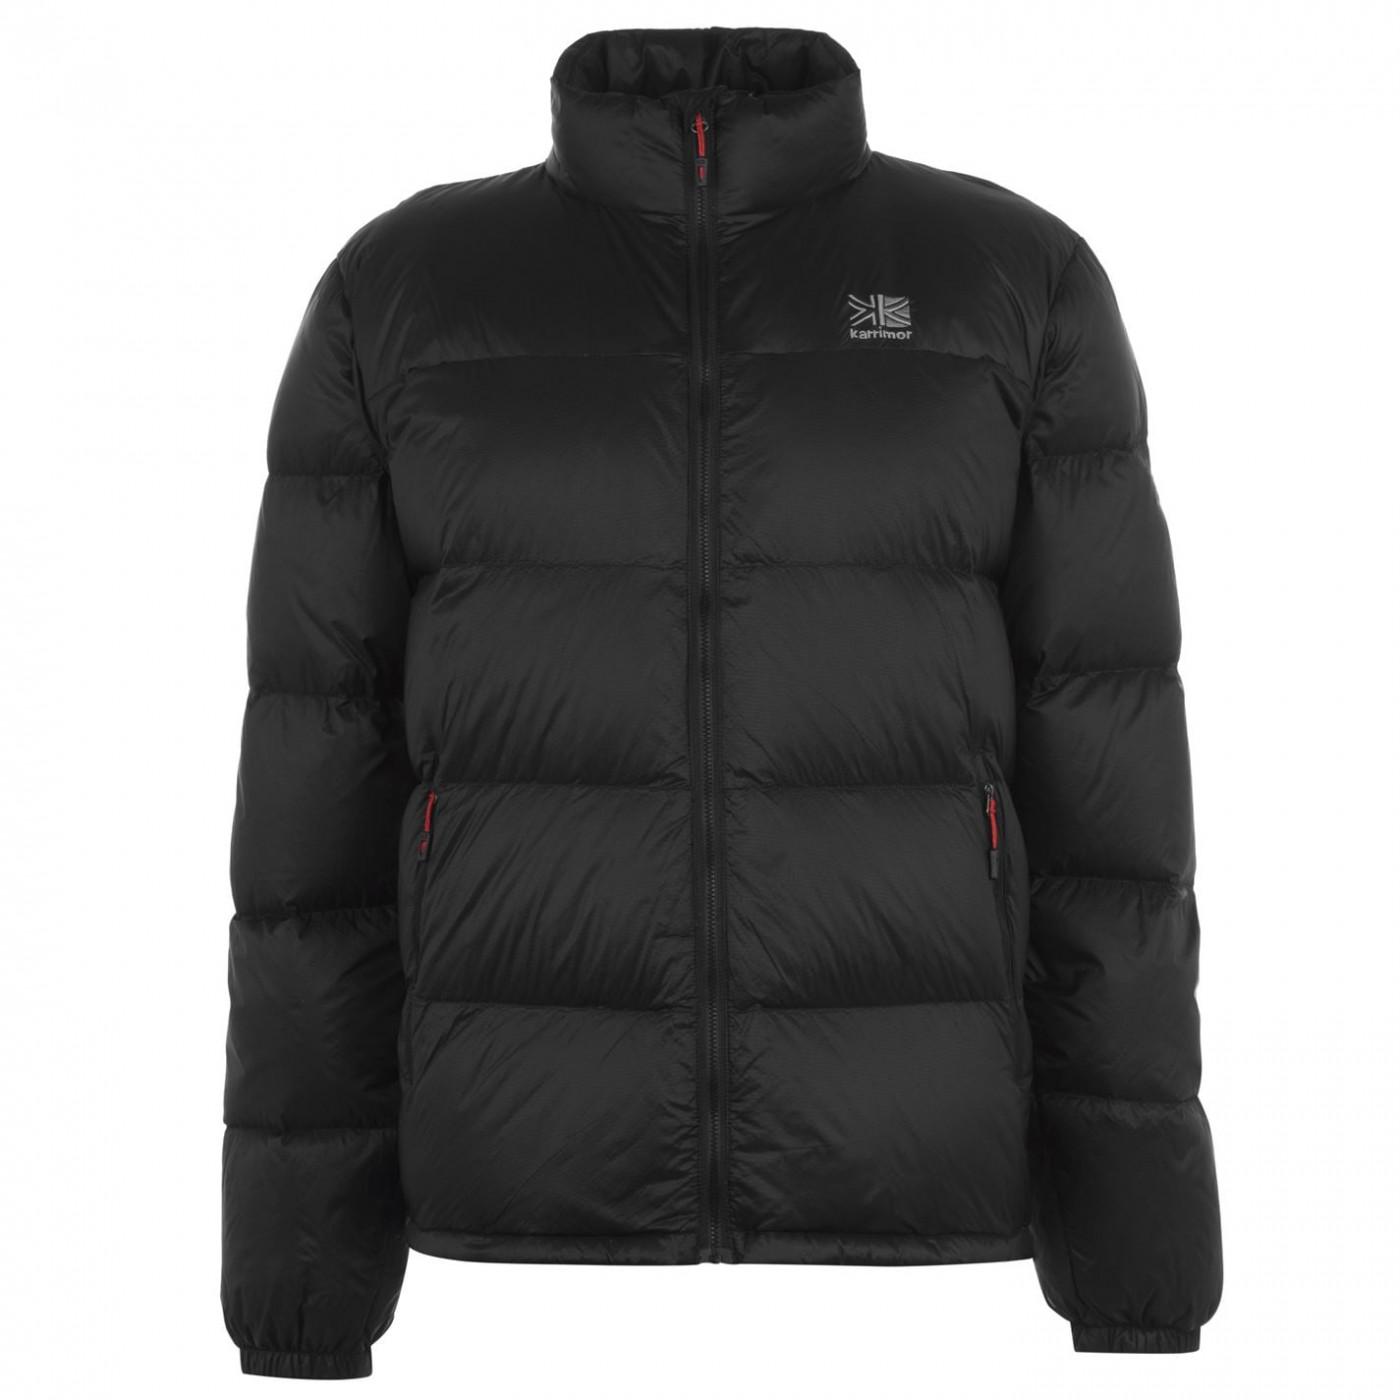 Men's jacket Karrimor Ice Down